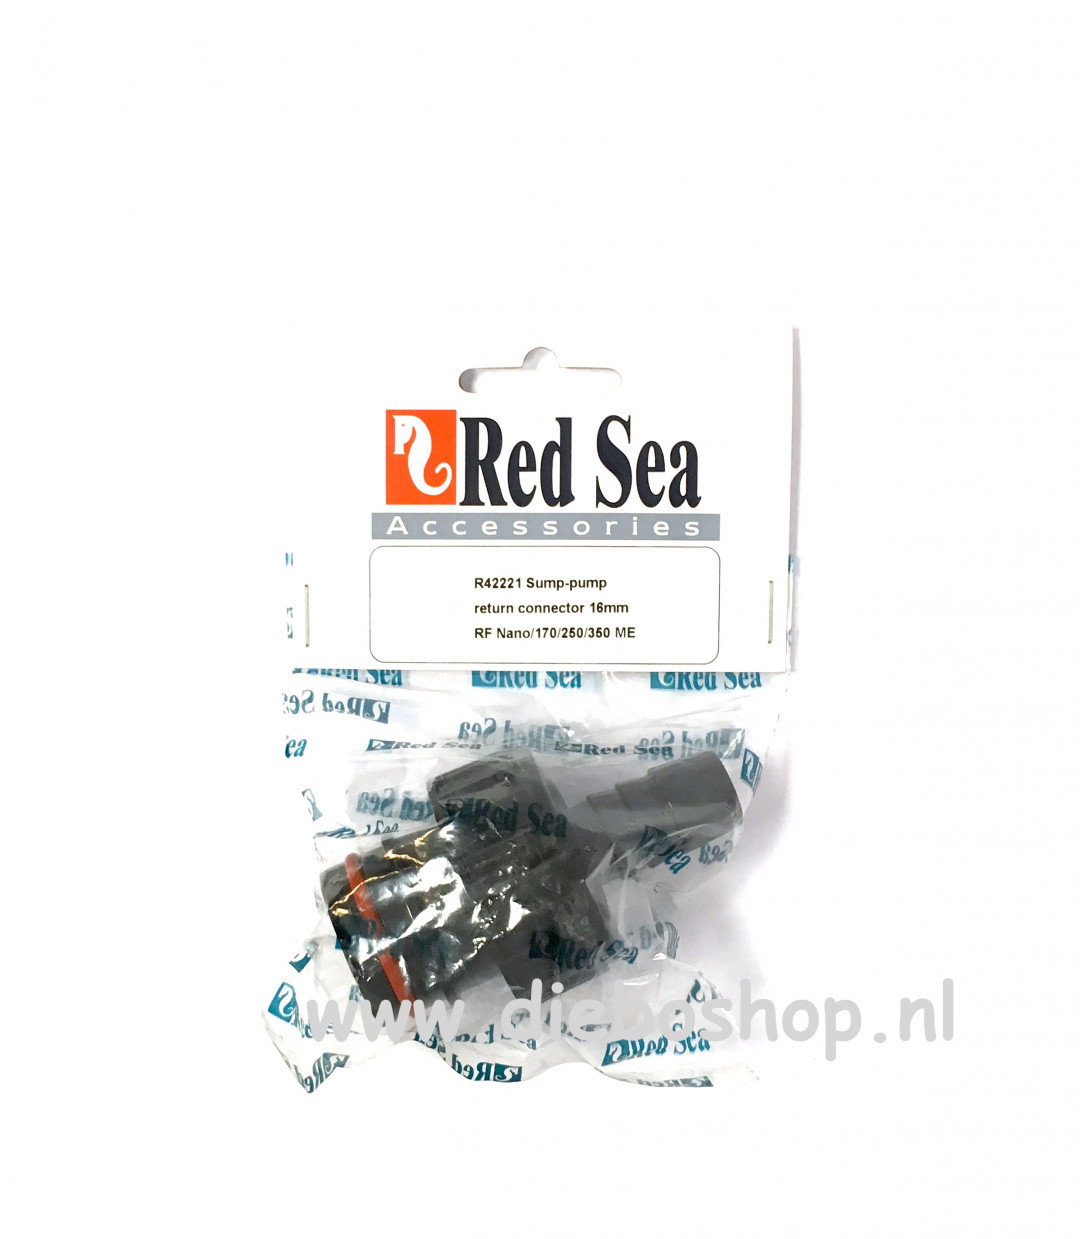 Red Sea Sump Pump Return Connector 16mm